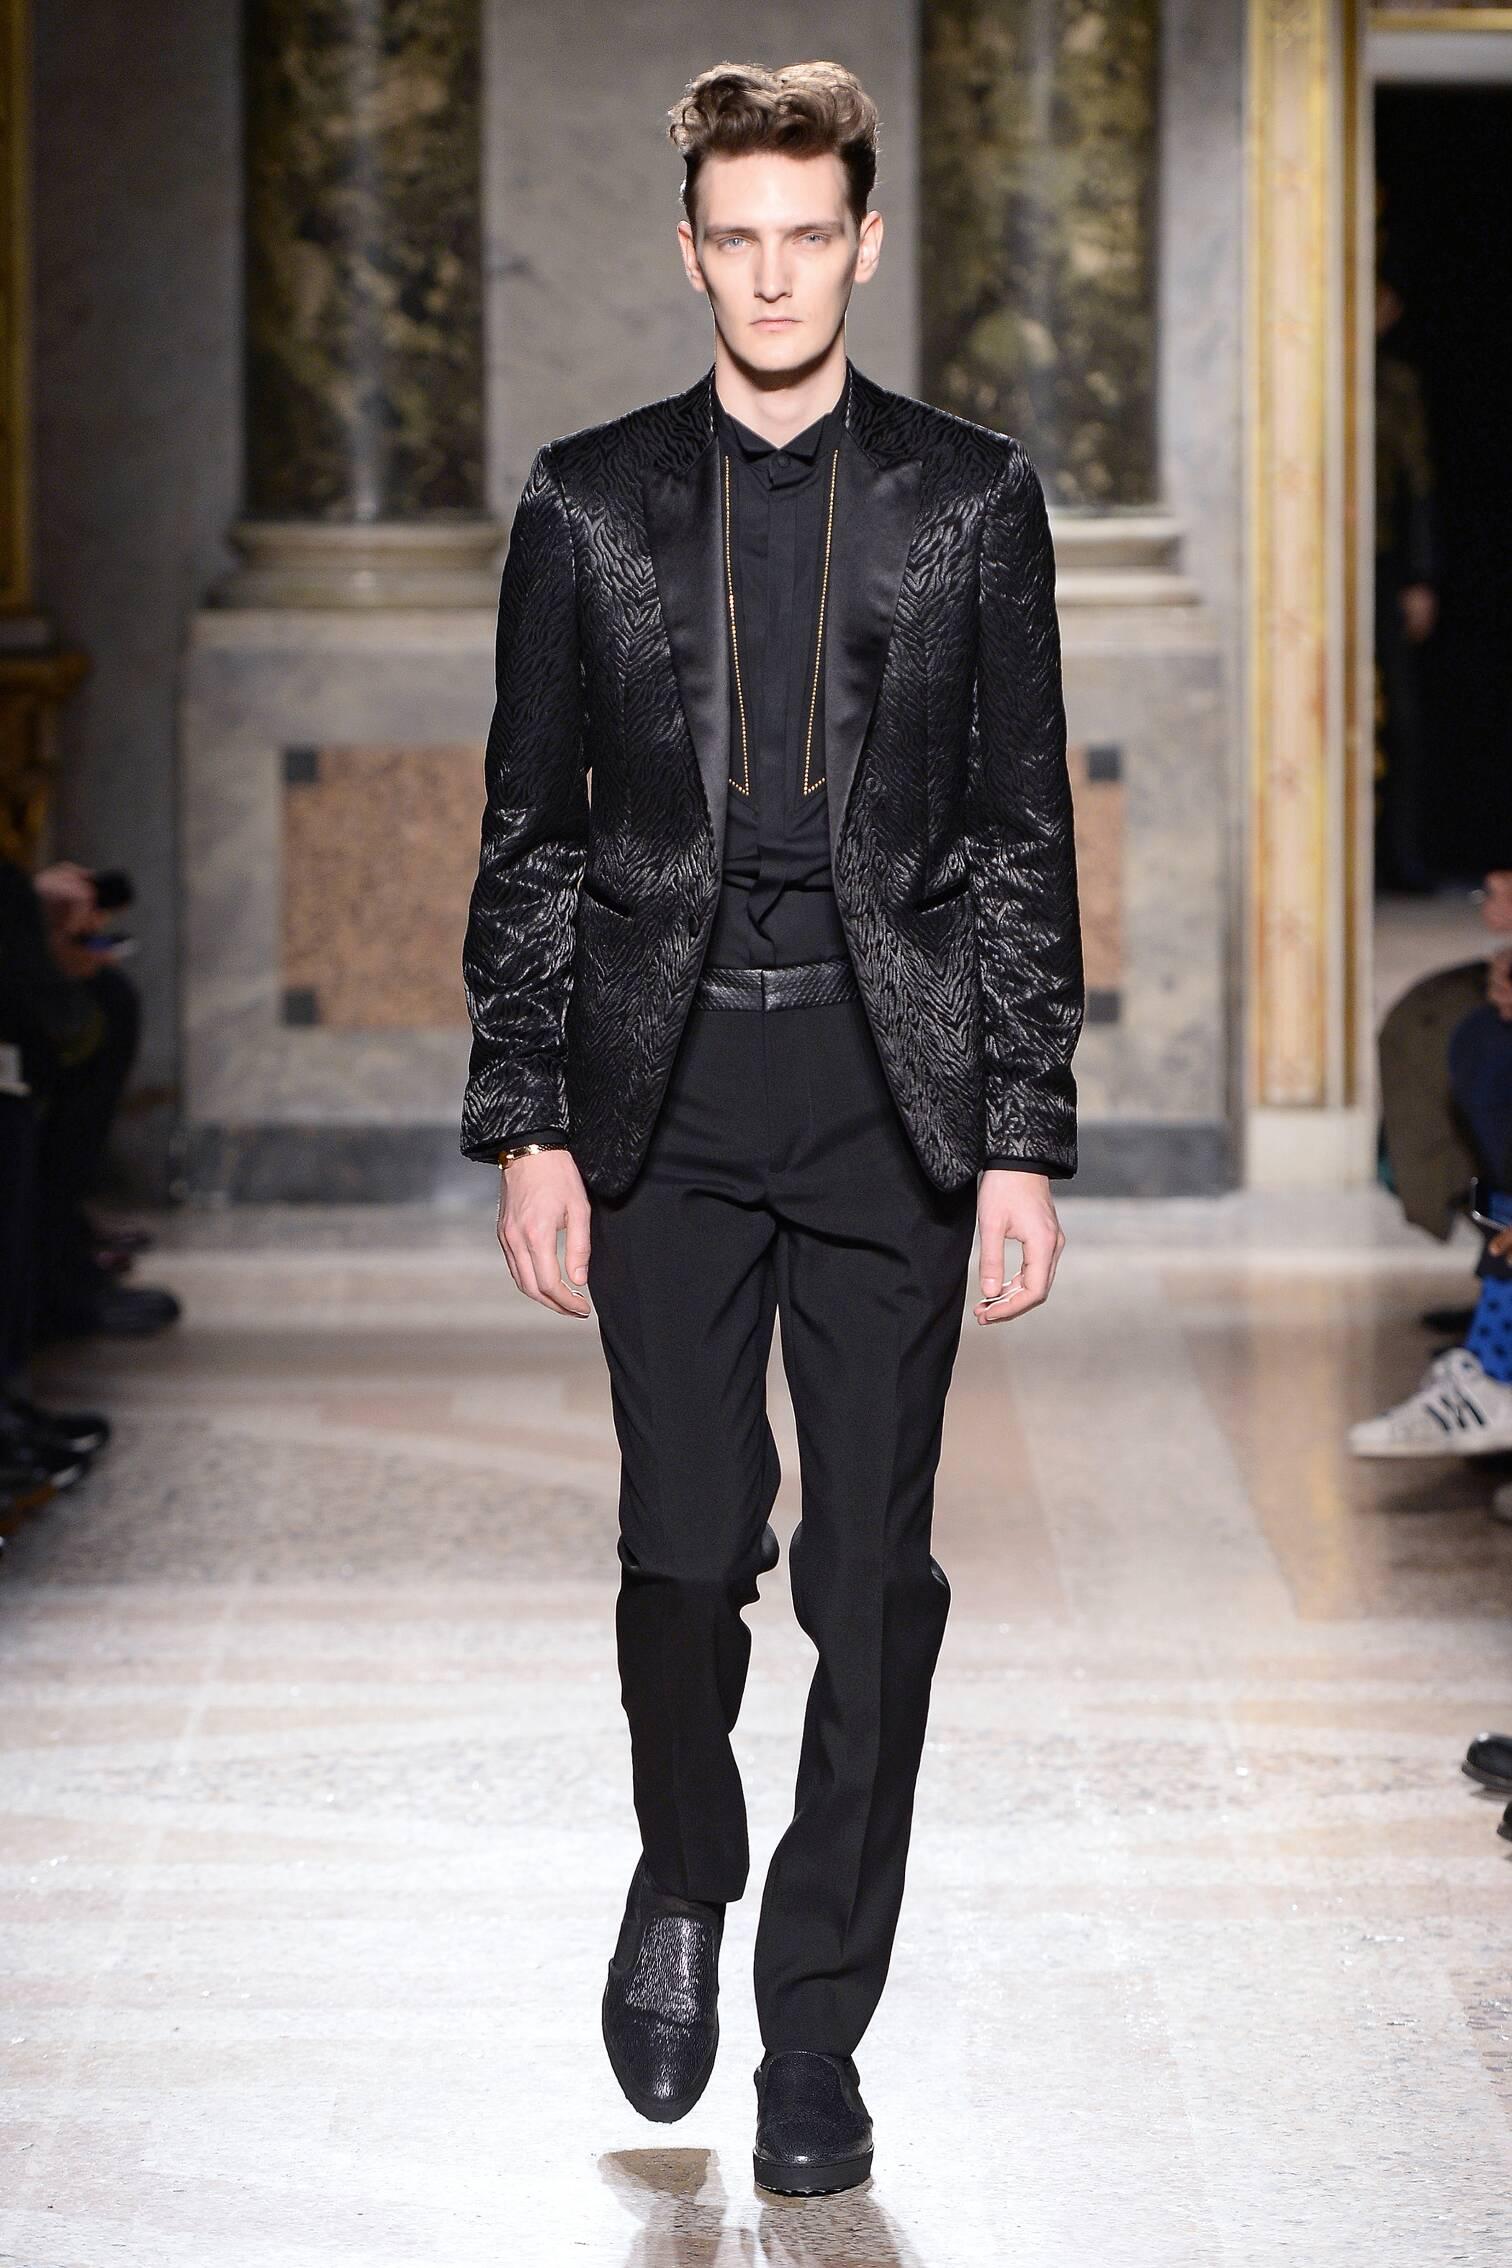 Catwalk Roberto Cavalli Fall Winter 2015 16 Men's Collection Milano Fashion Week